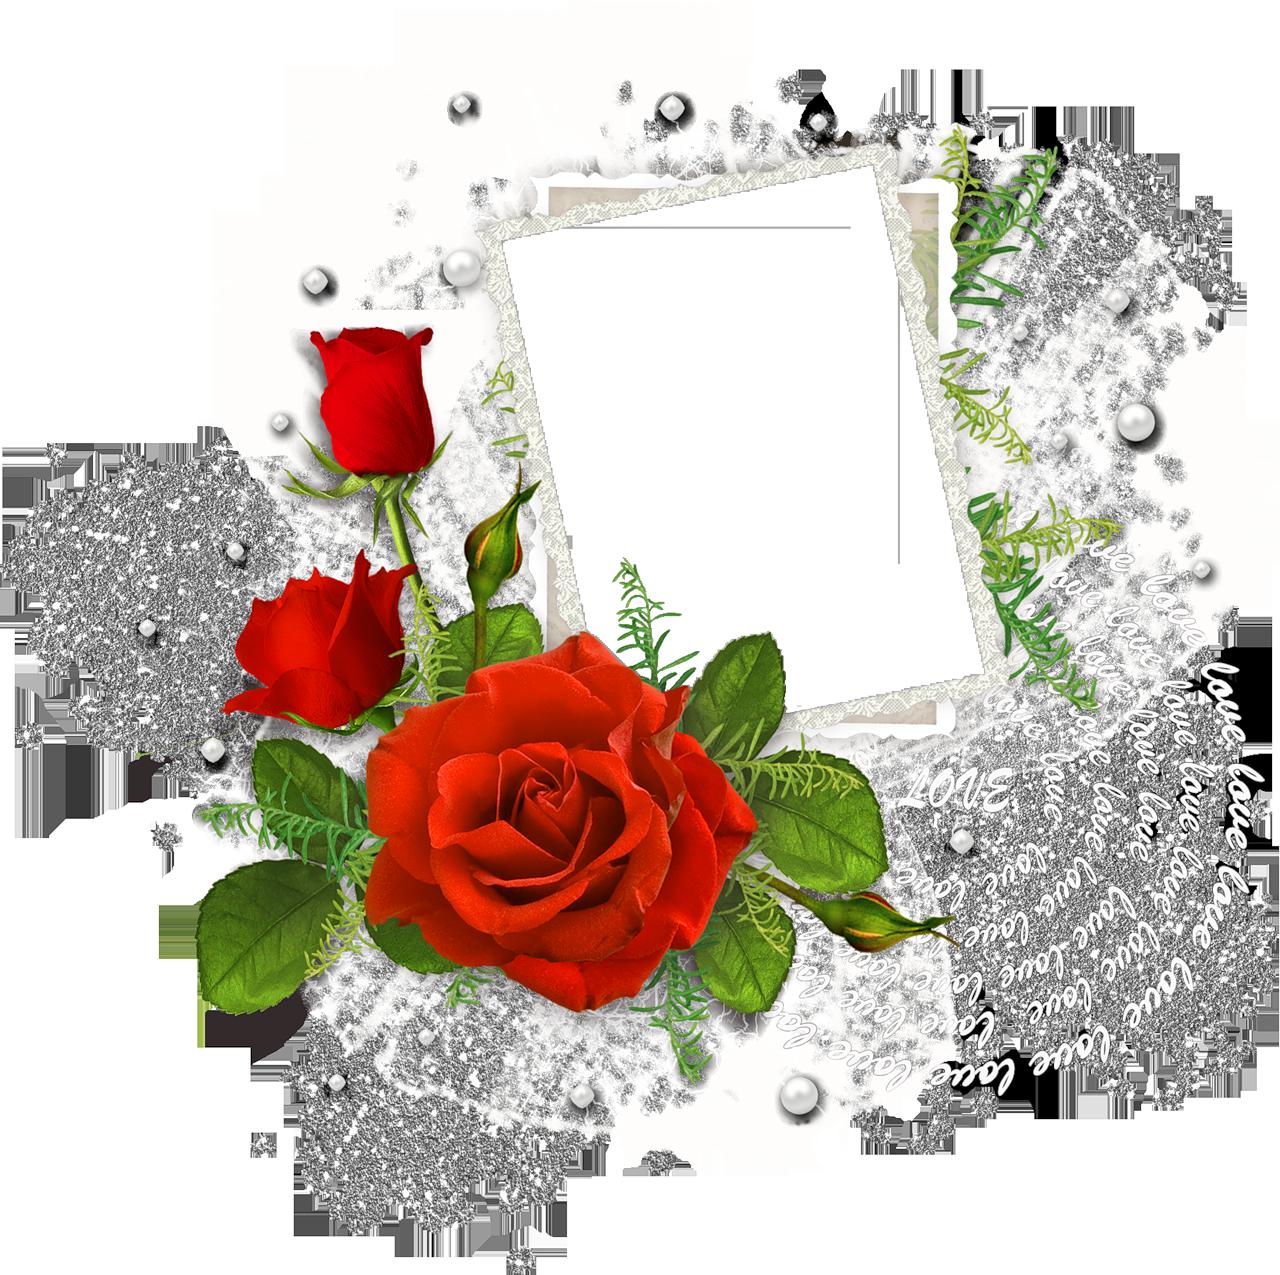 http://img-fotki.yandex.ru/get/5905/svetlera.13/0_4f956_68a19883_orig.png